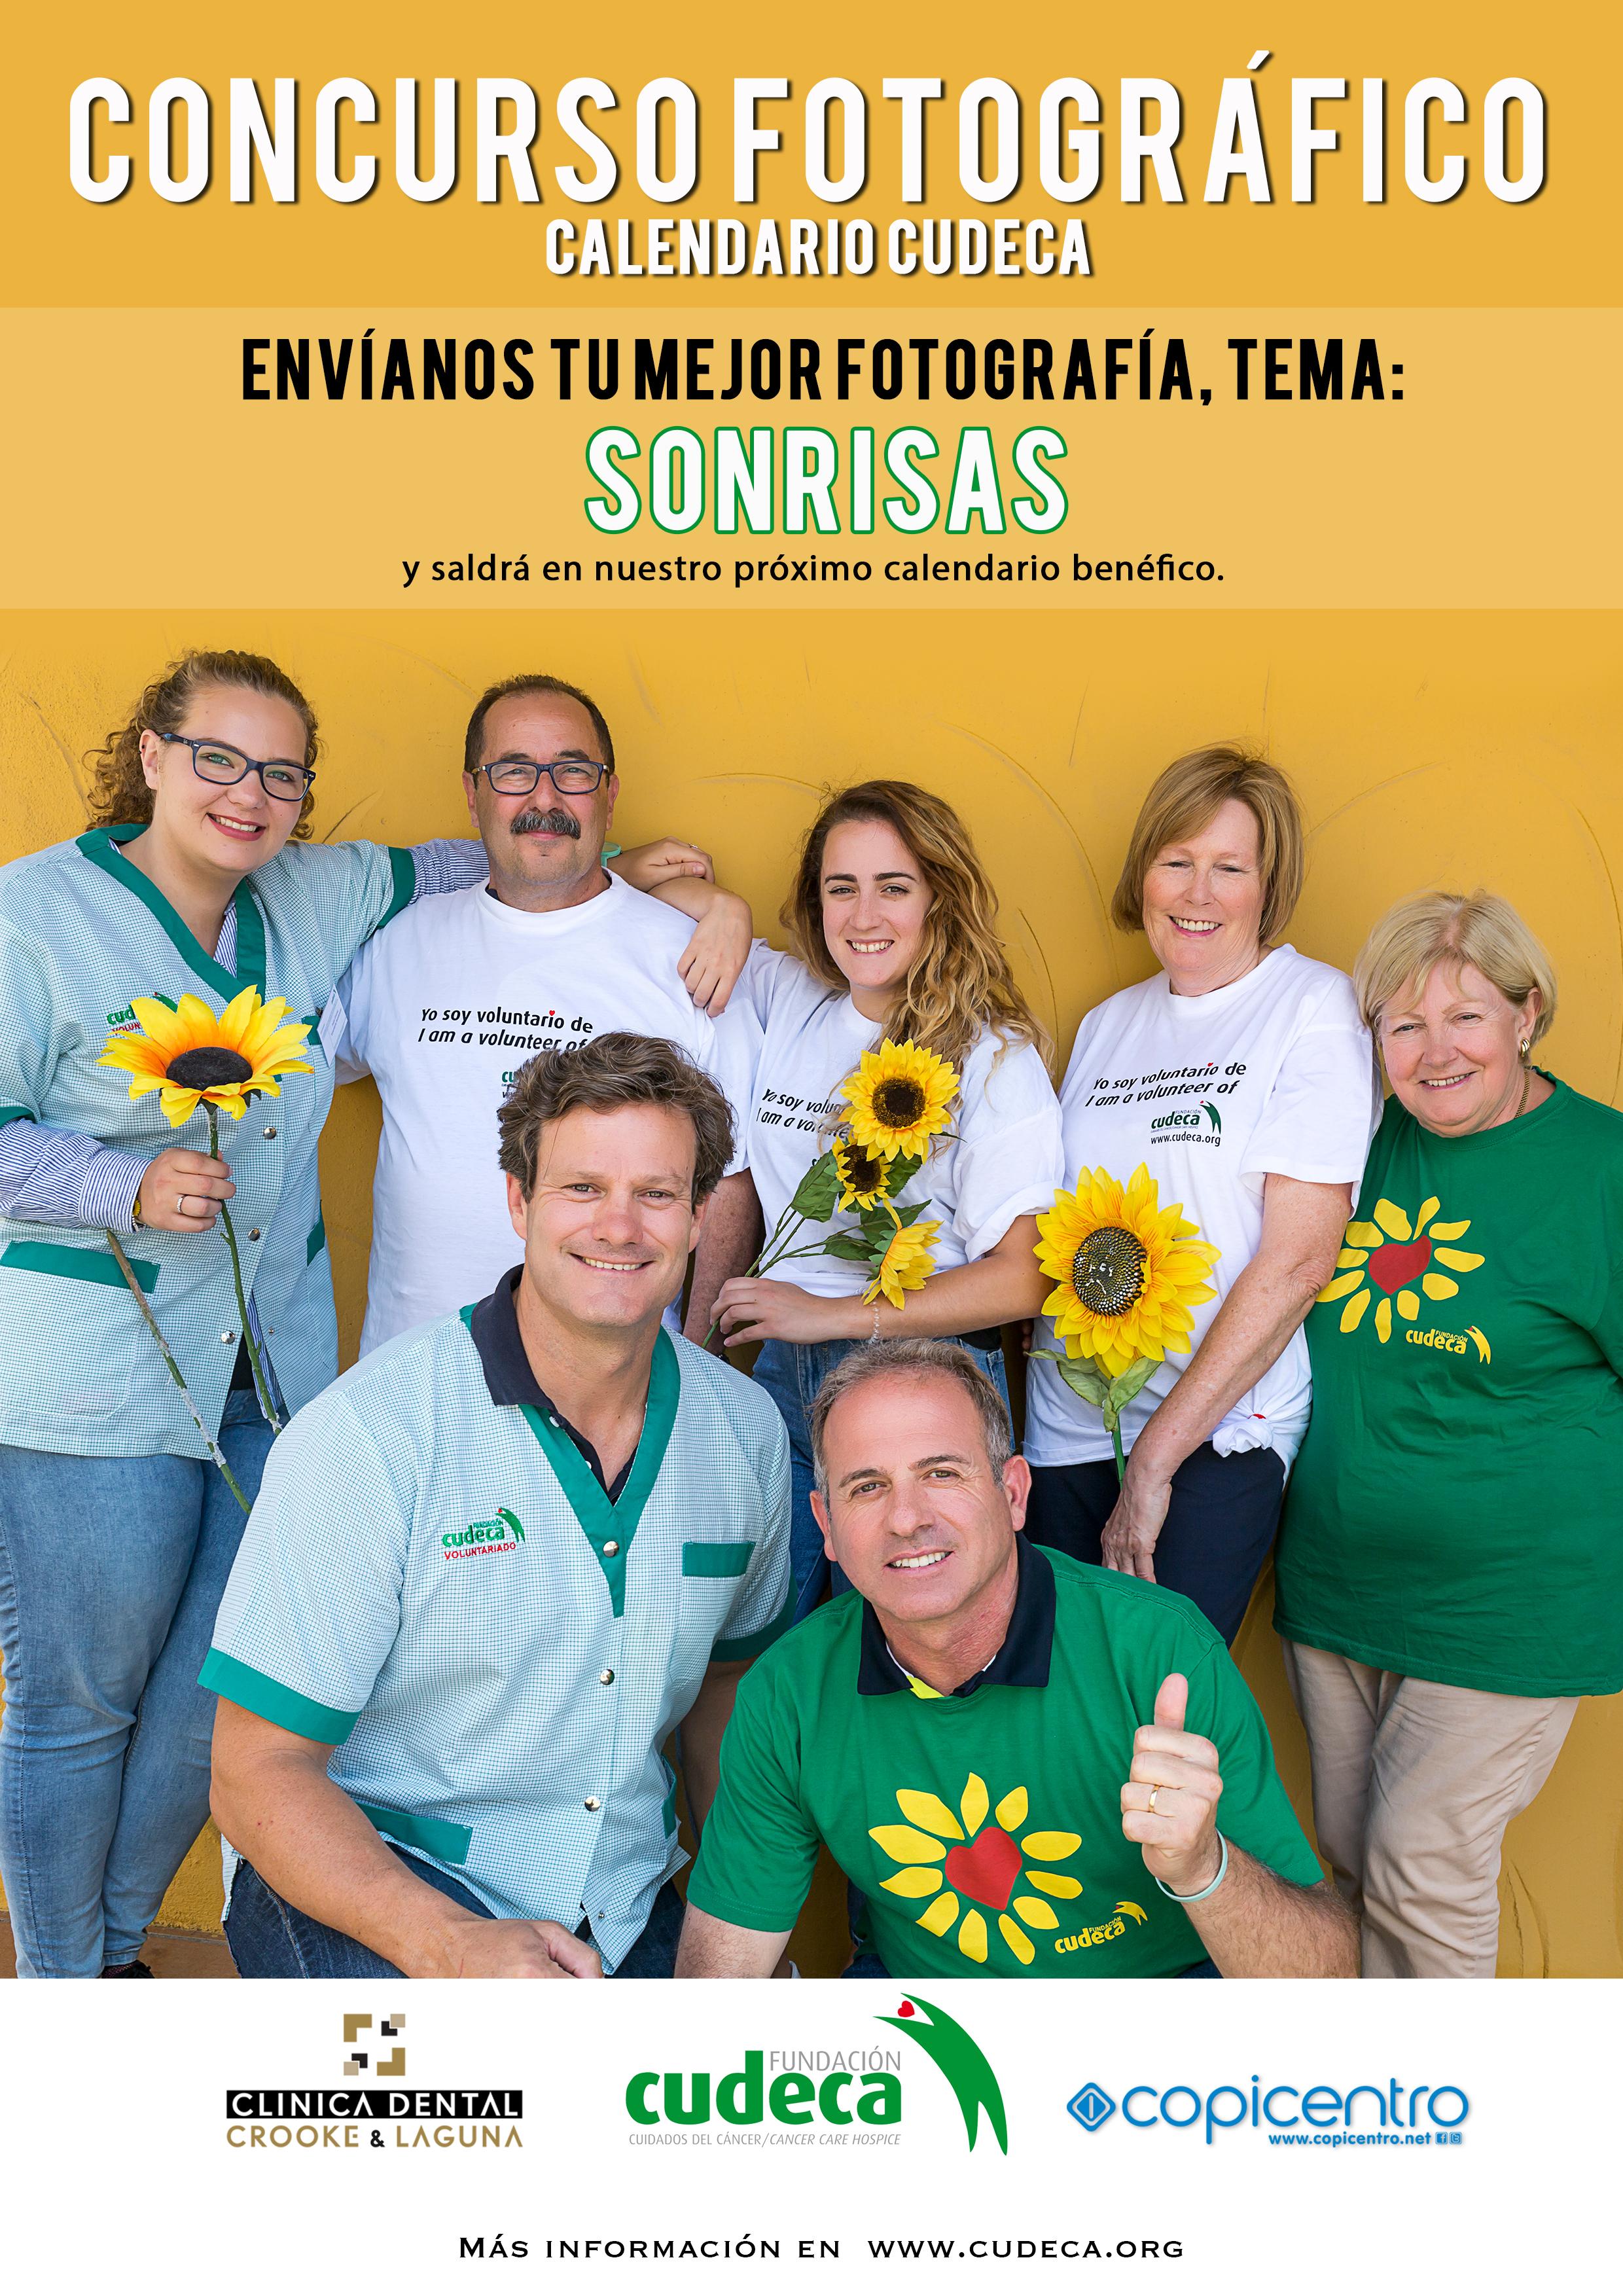 2021 Cudeca Calendar Photo Competition